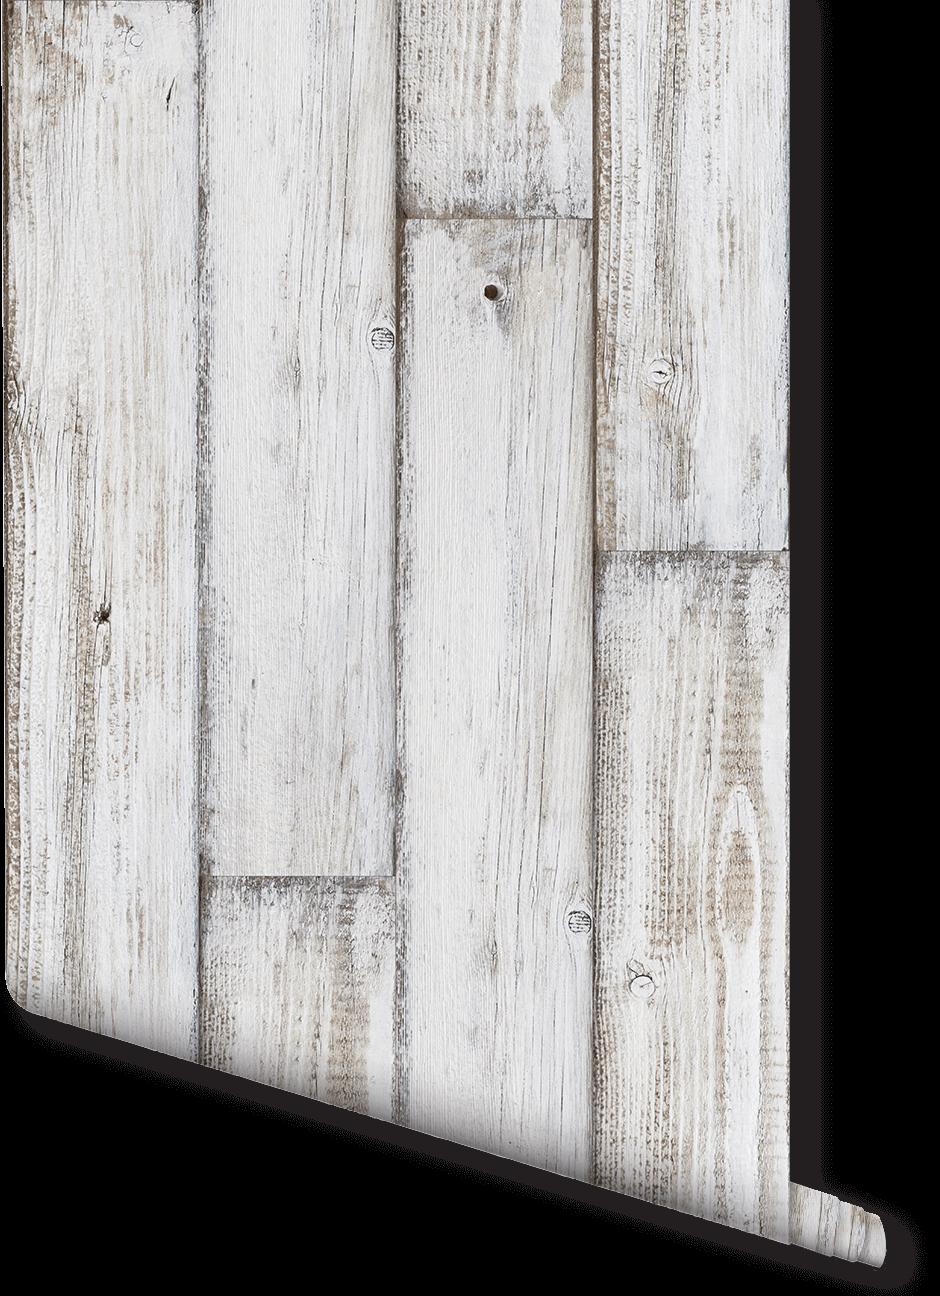 scrapwoodtexturewallpaper Wood wallpaper